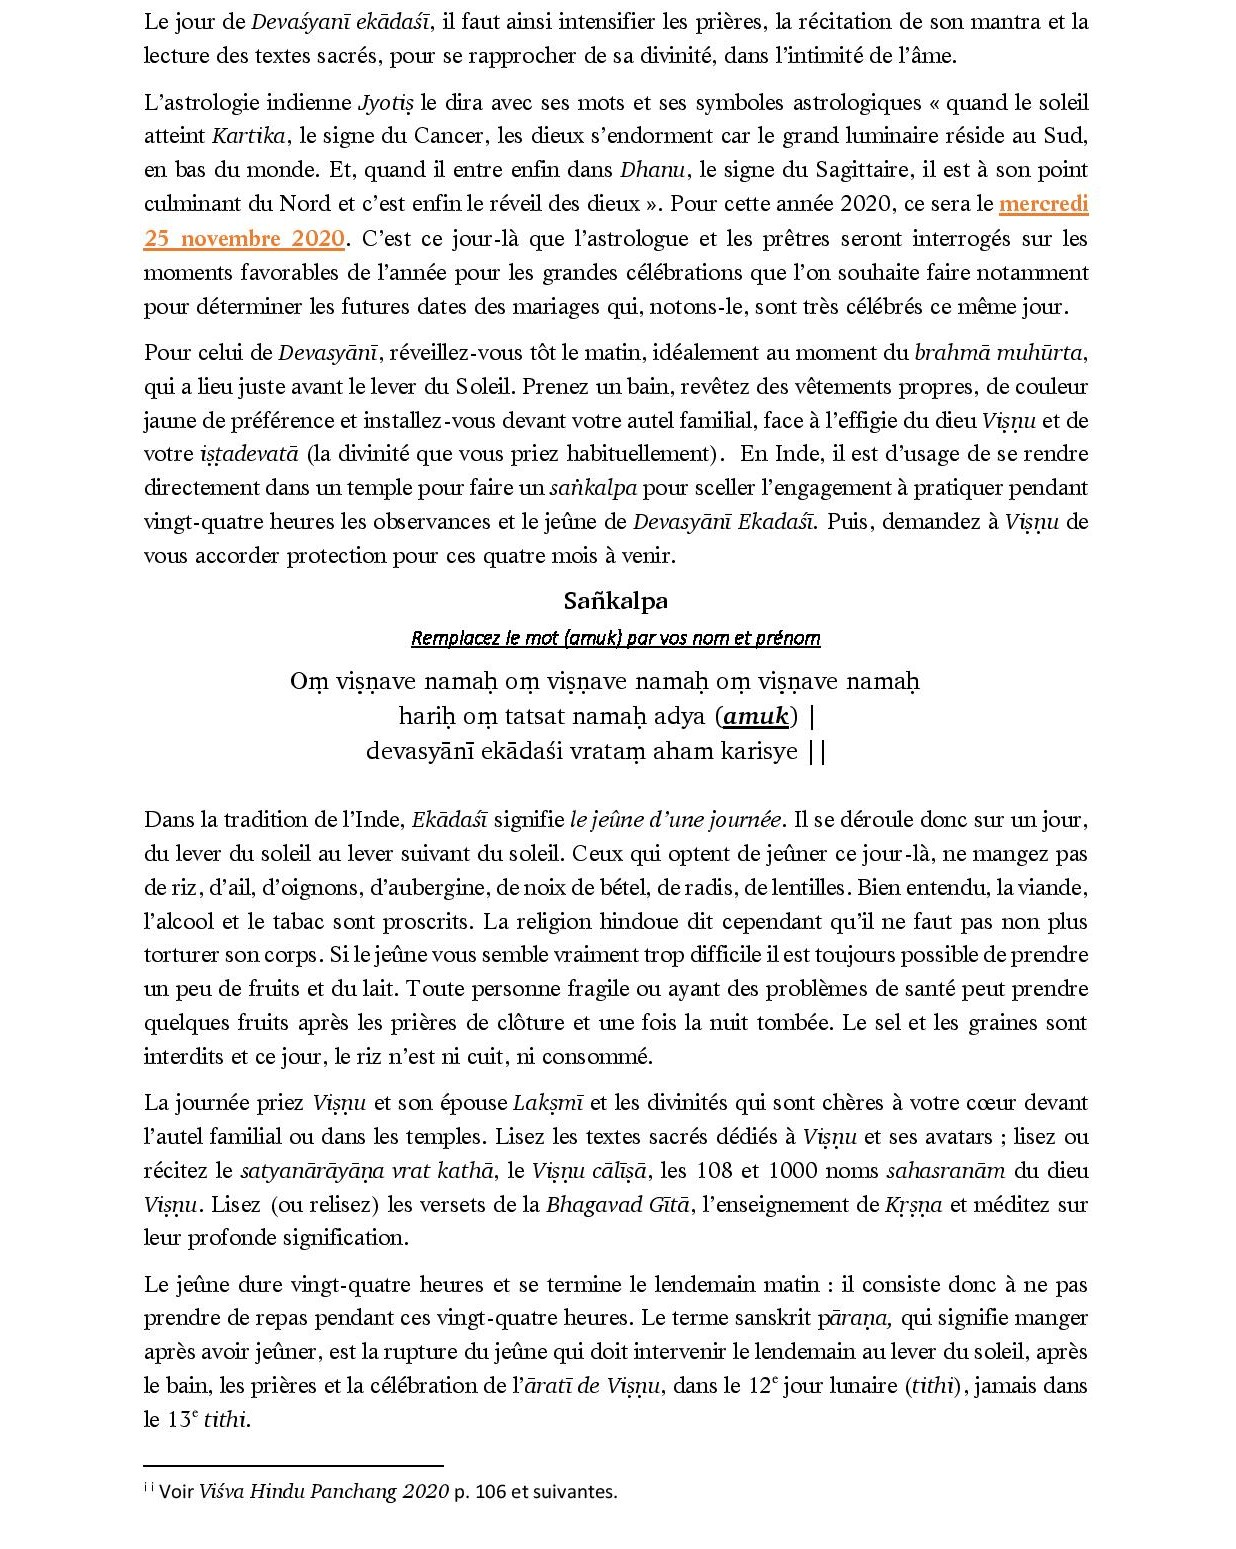 Devasyani ekadashi texte-page-002-1